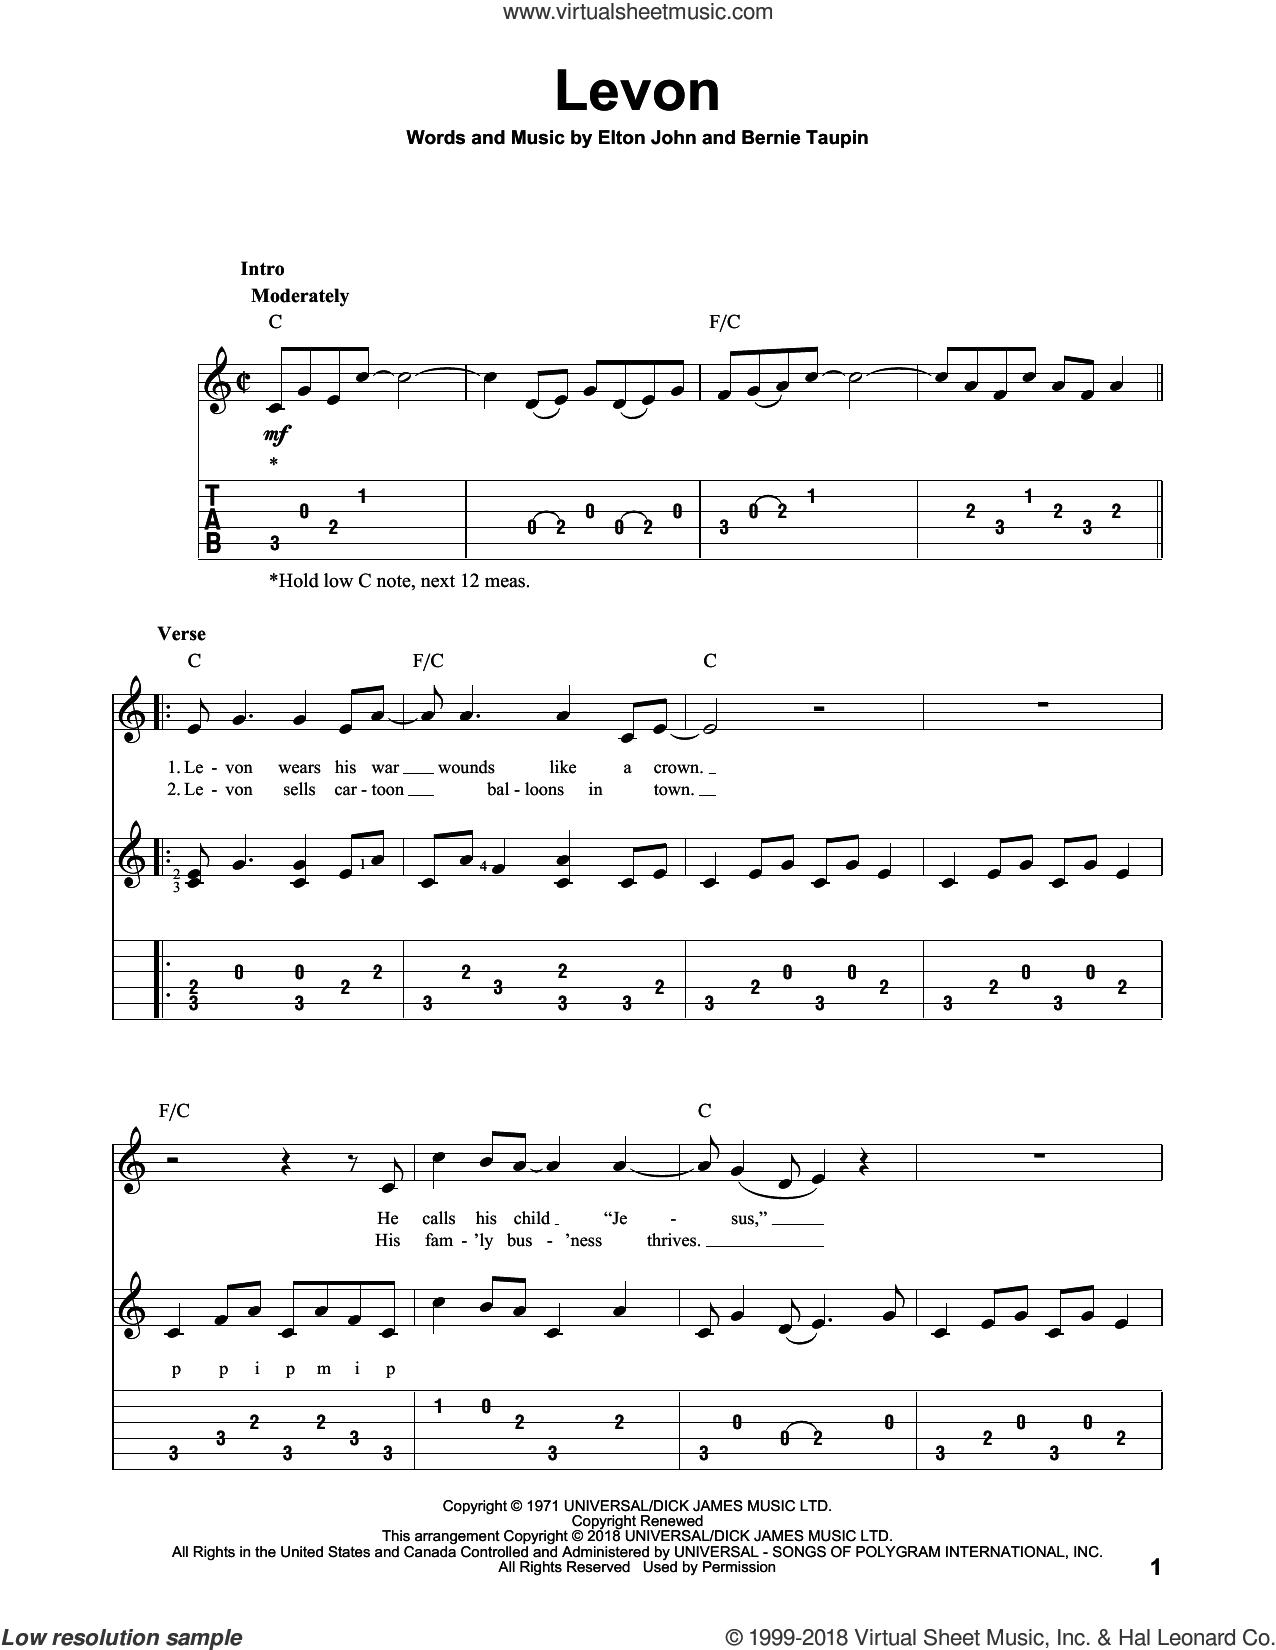 Levon sheet music for guitar solo by Elton John and Bernie Taupin, intermediate skill level